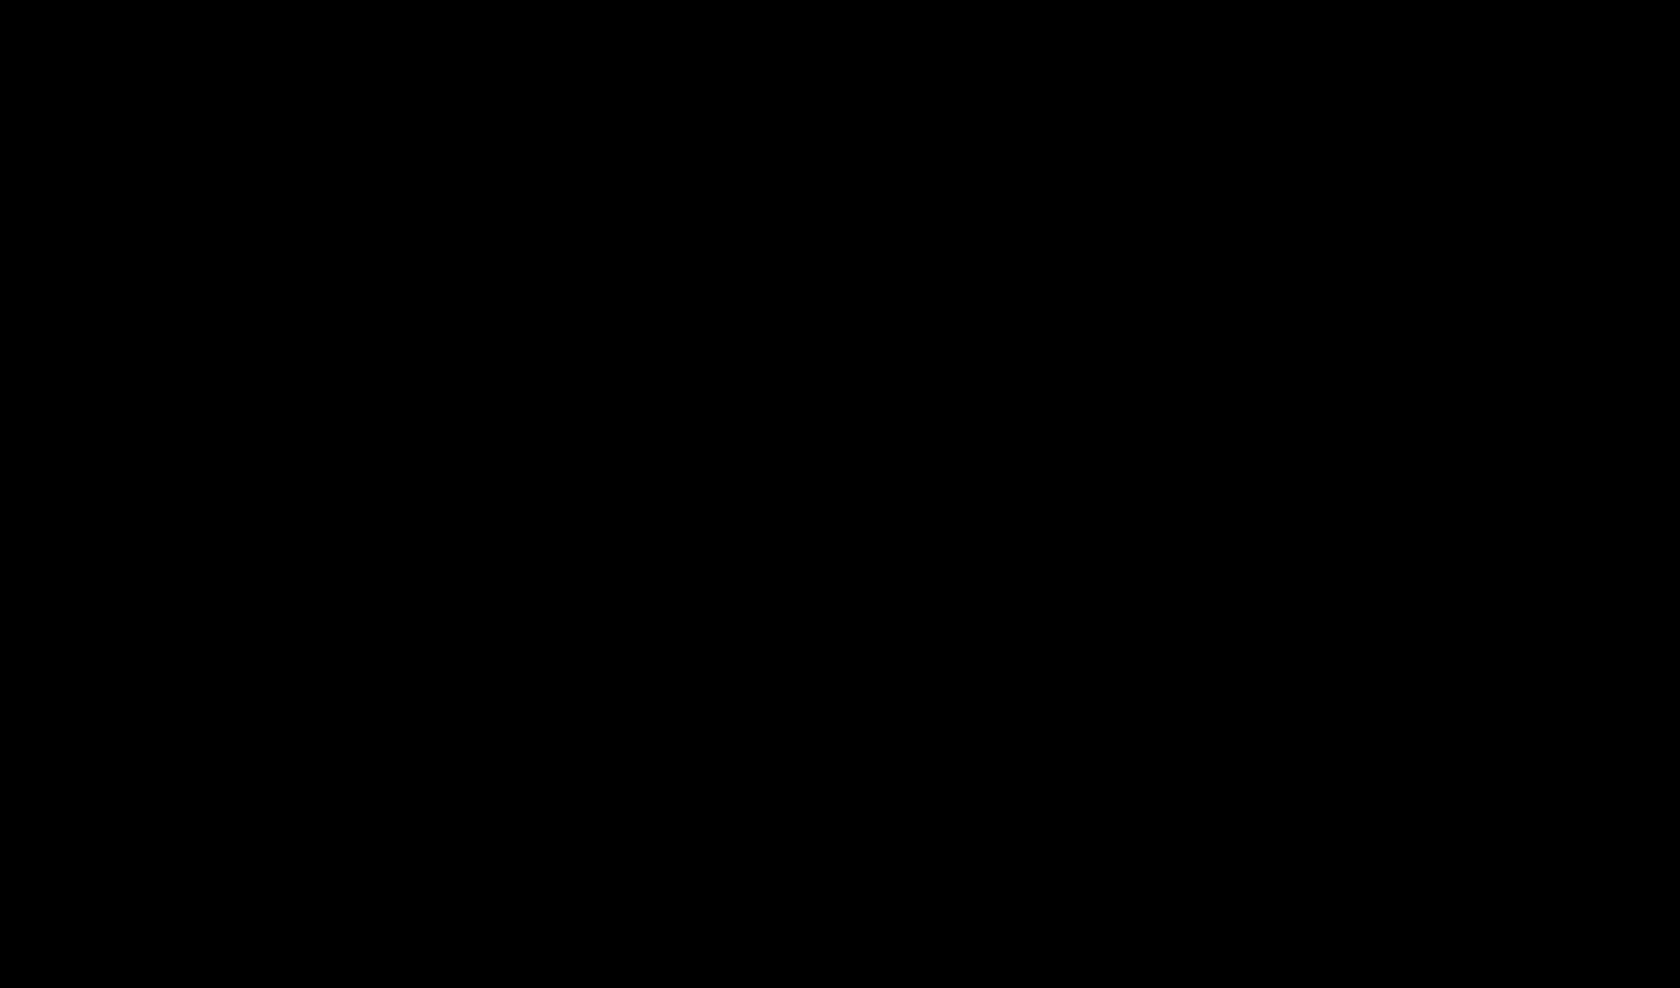 6-(Dansylamino)hexanoic acid